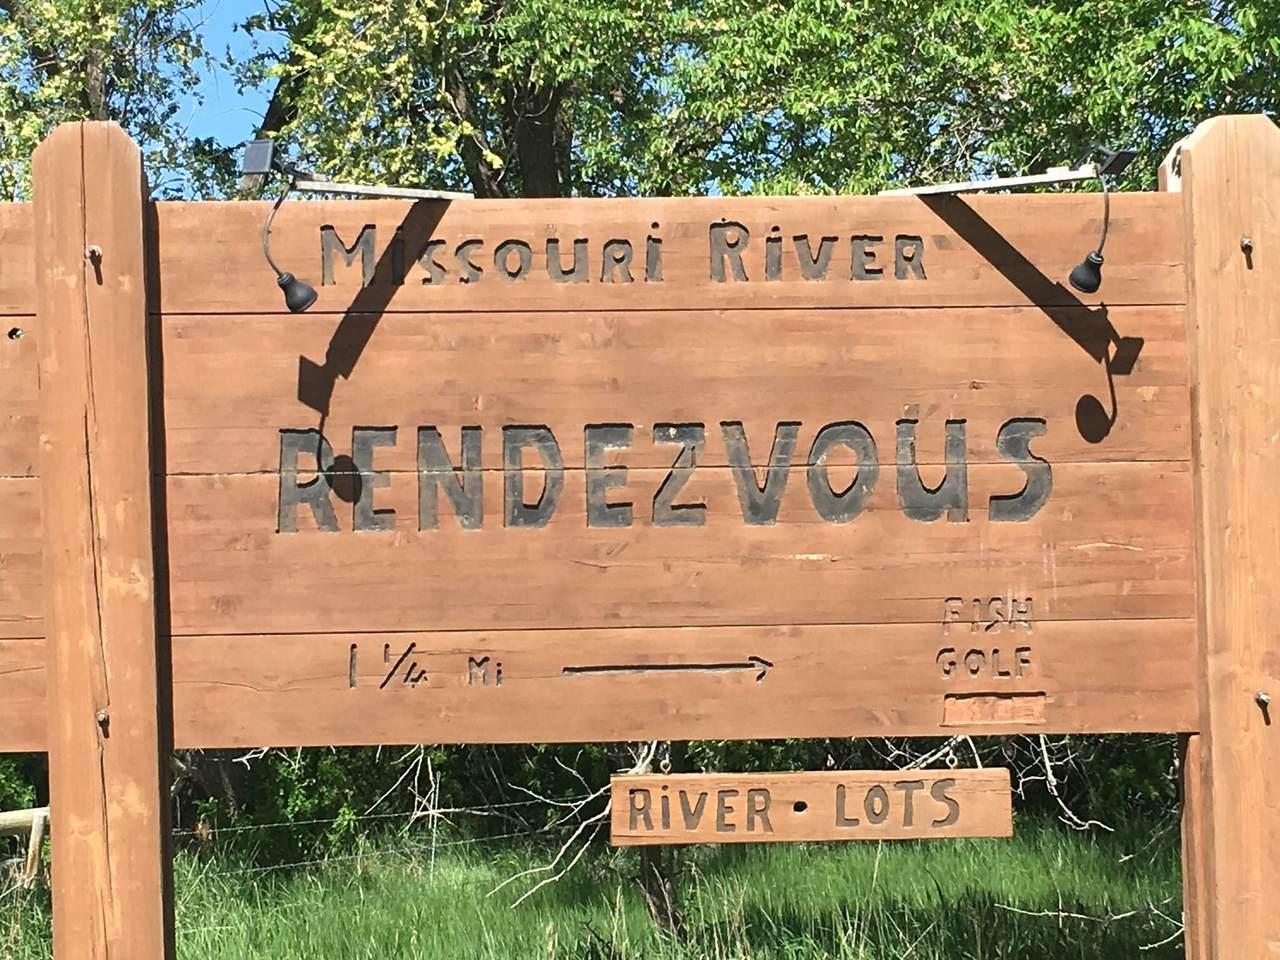 Lot 28 Misouri River Rendezvous - Photo 1